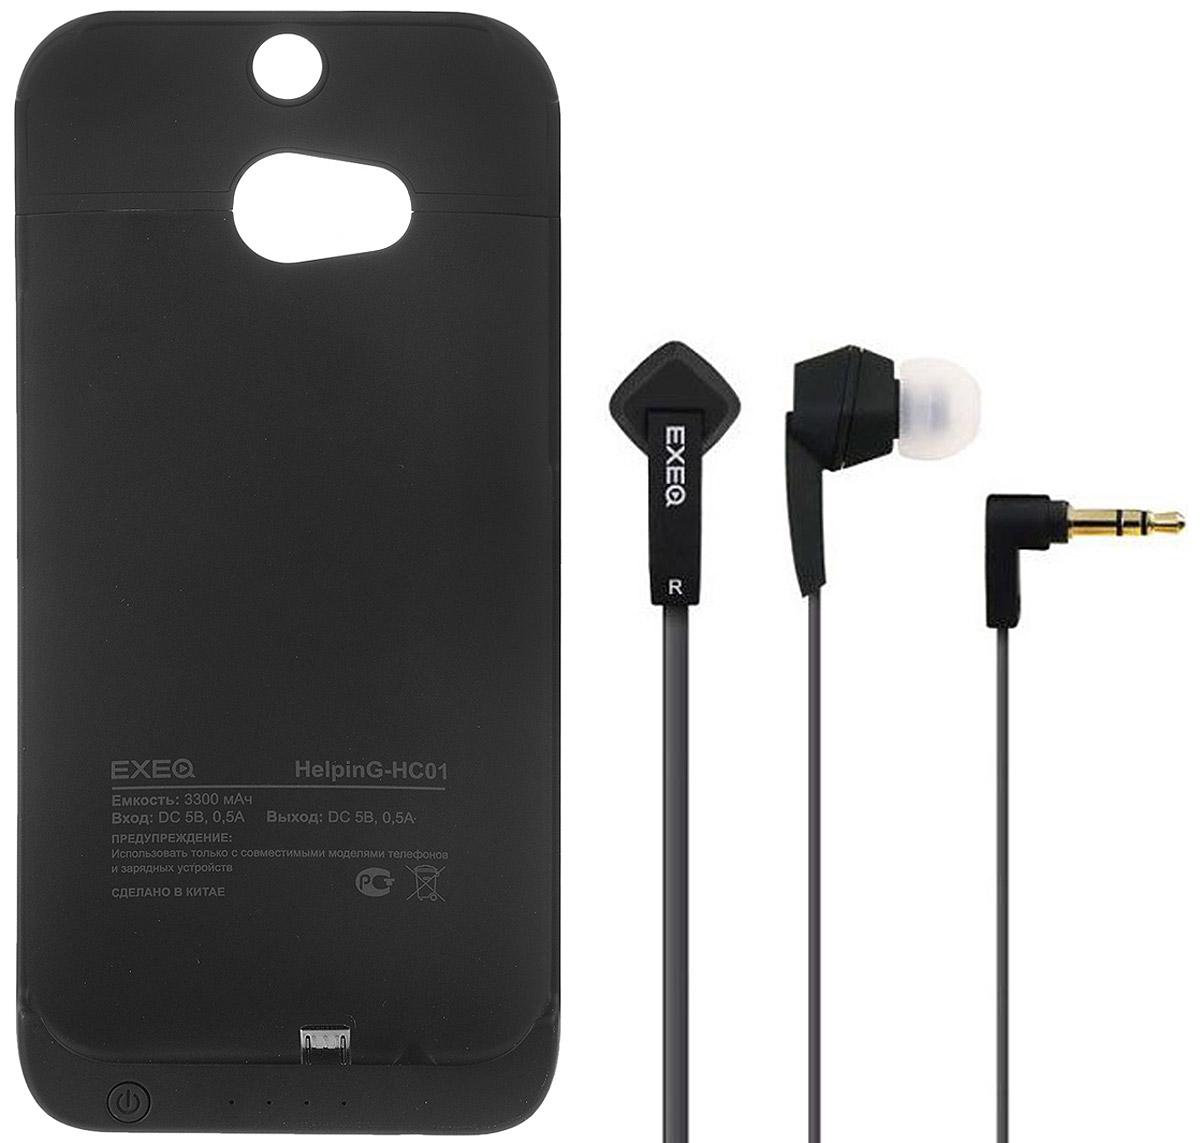 EXEQ HelpinG-HC01 чехол-аккумулятор для HTC One M8, Black (3300 мАч, клип-кейс)